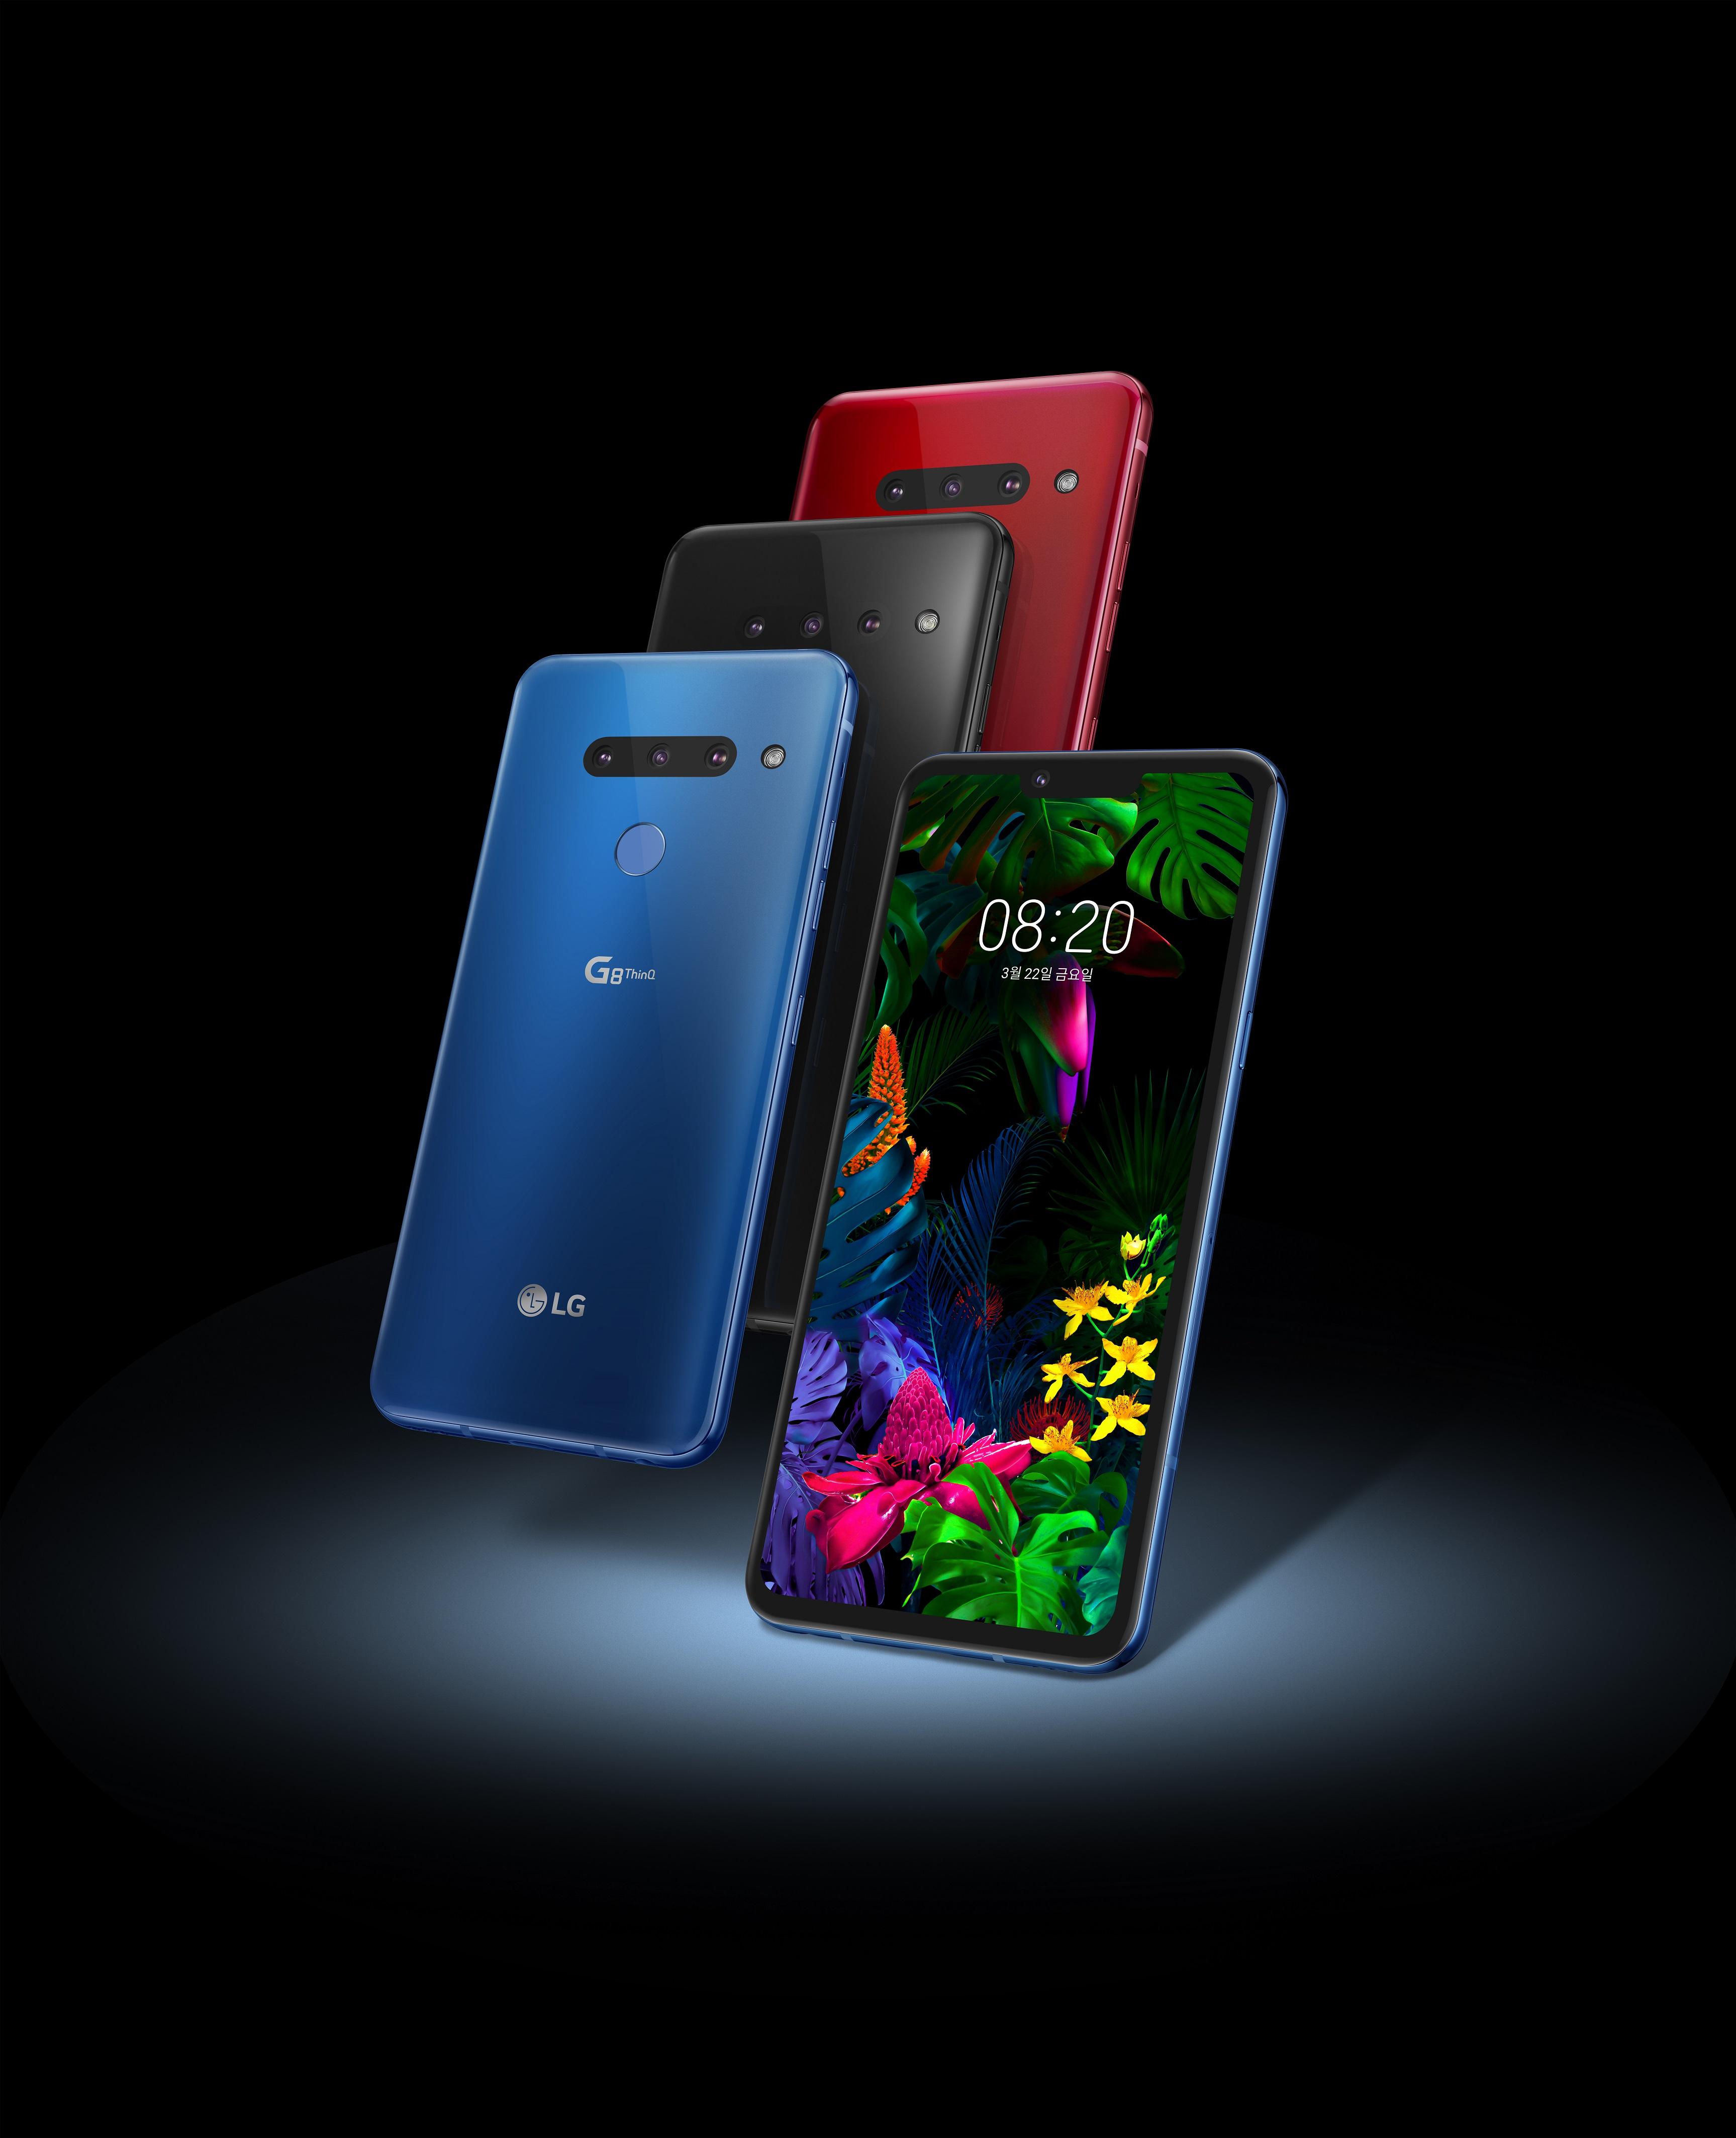 LG G8 ThinQ 체험단, 고객 관심 제대로 끌었다